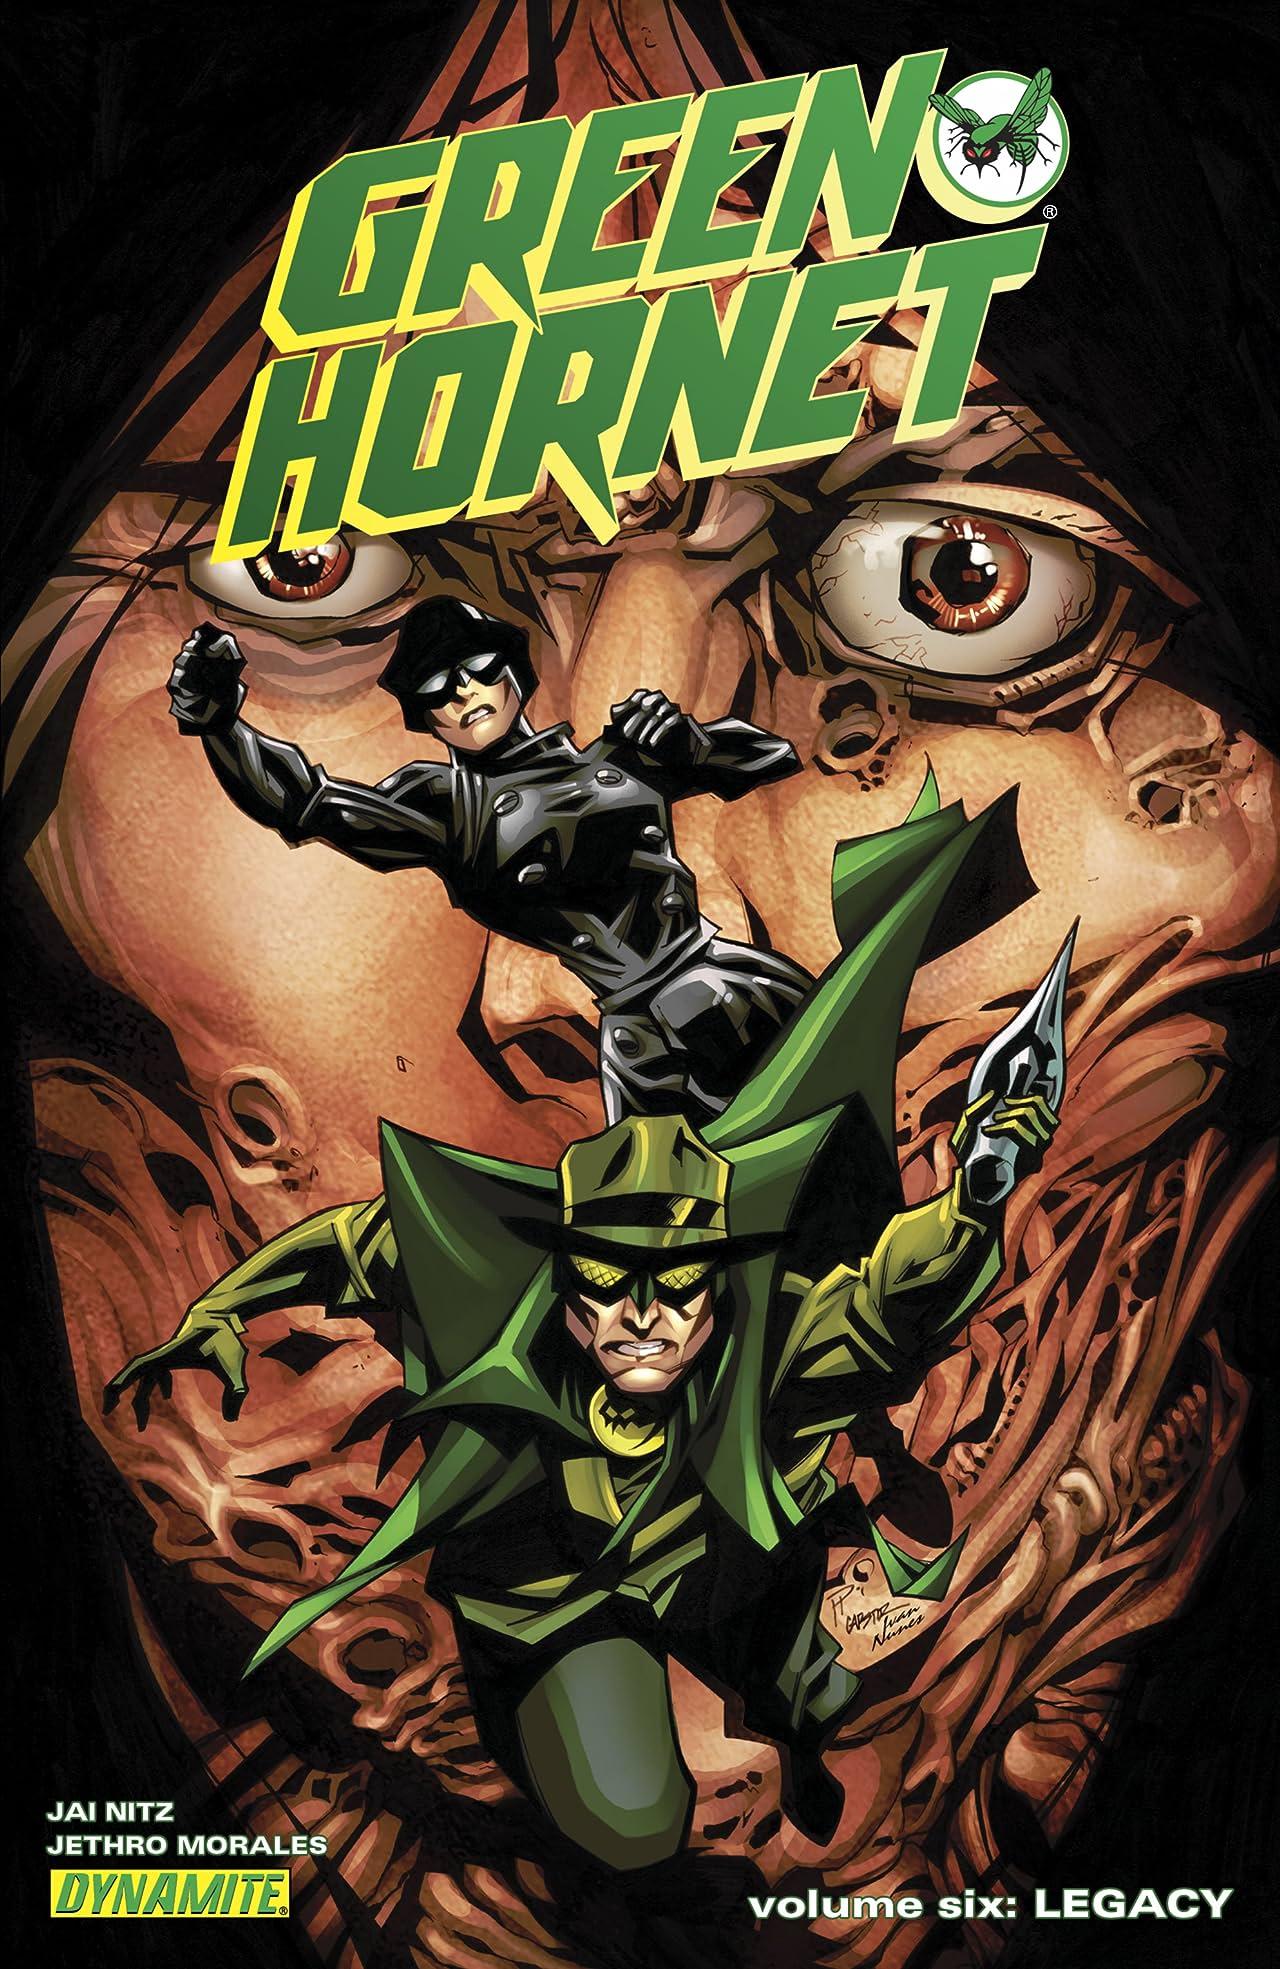 Green Hornet Vol. 6: Legacy